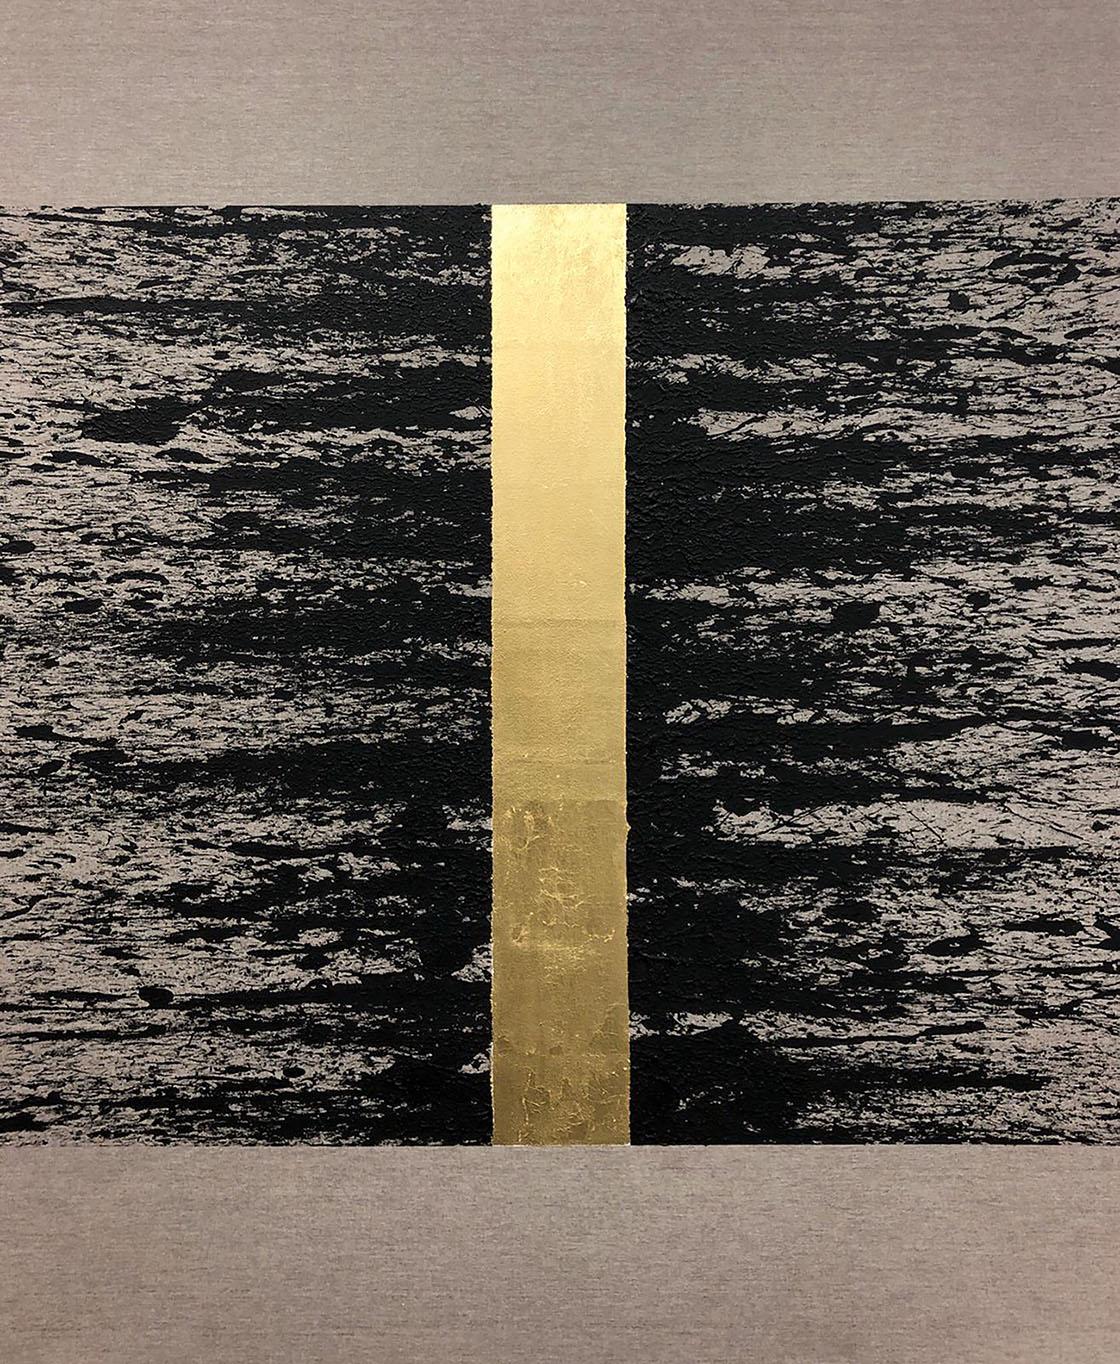 'Expansion 2, 2020' - Mareo Rodriguez at Kostuik Gallery